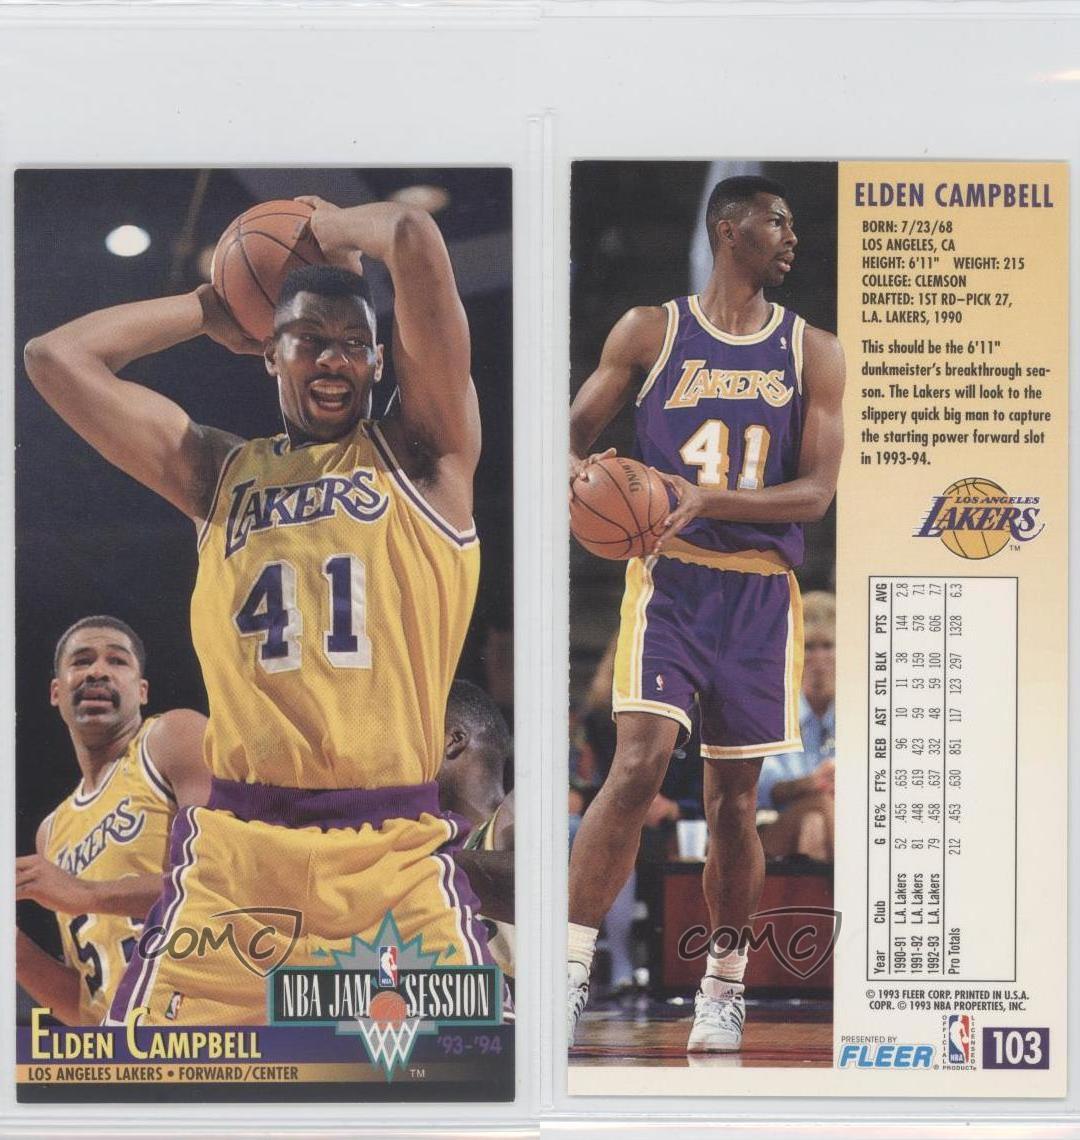 1993-94 NBA Jam Session #103 Elden Campbell Los Angeles